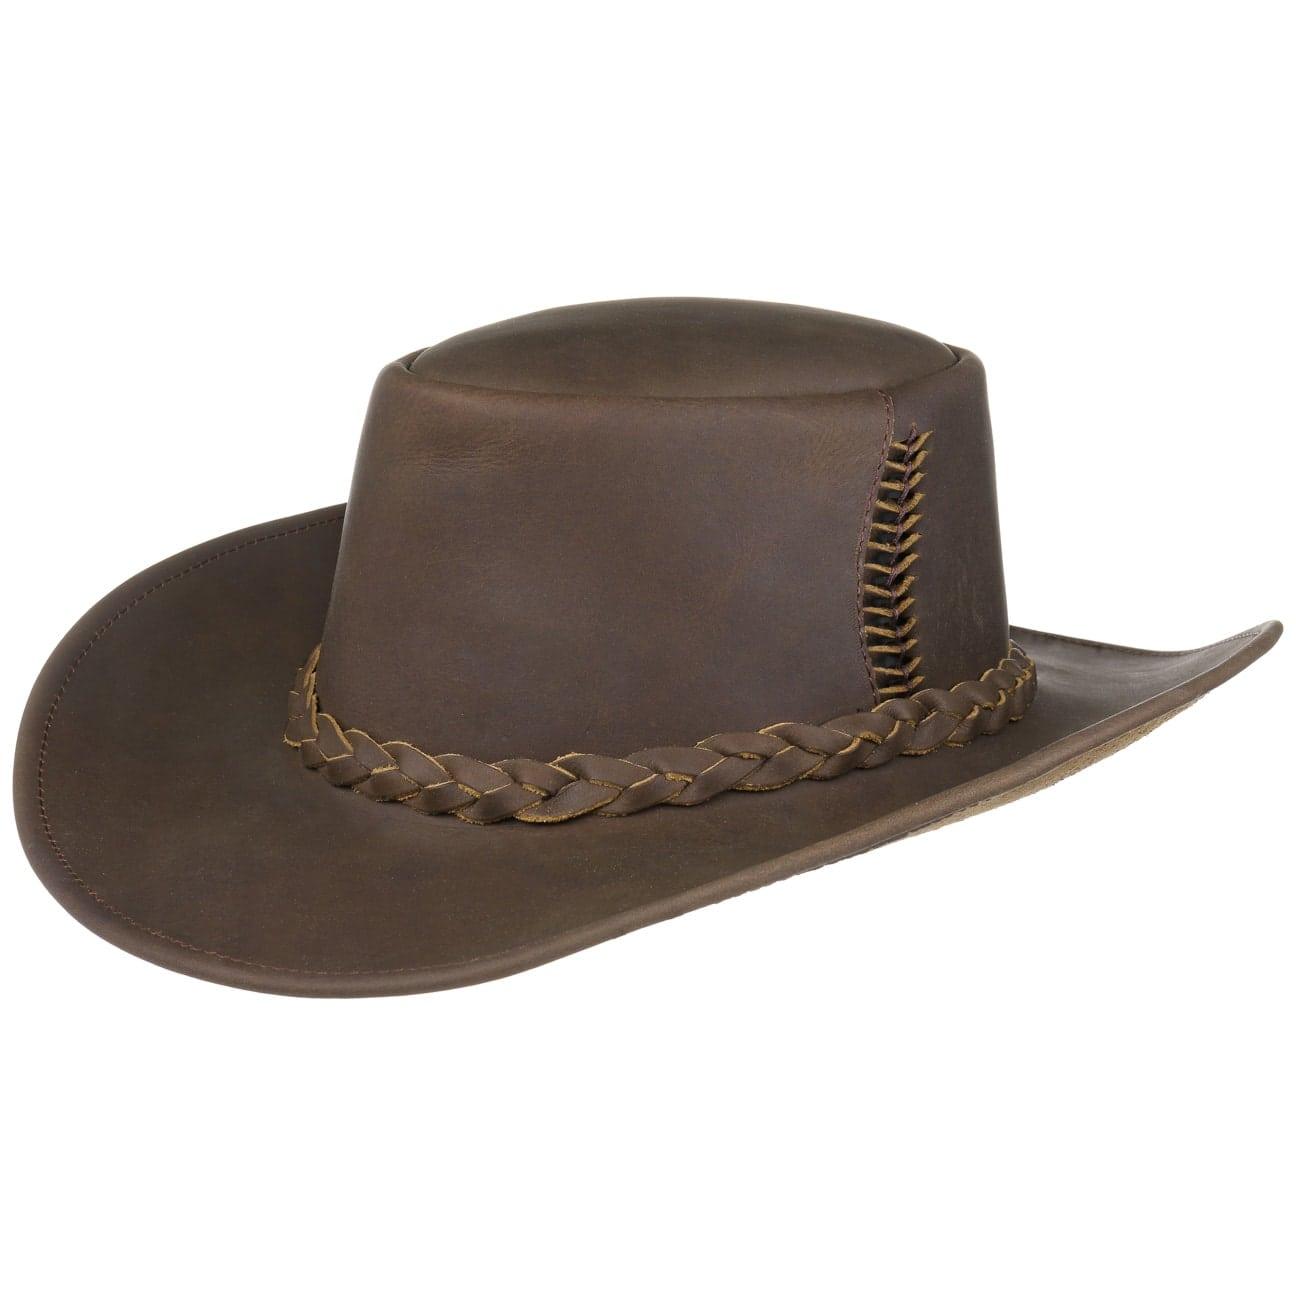 Sombrero de Piel Cobram by Kakadu Traders  sombrero outback